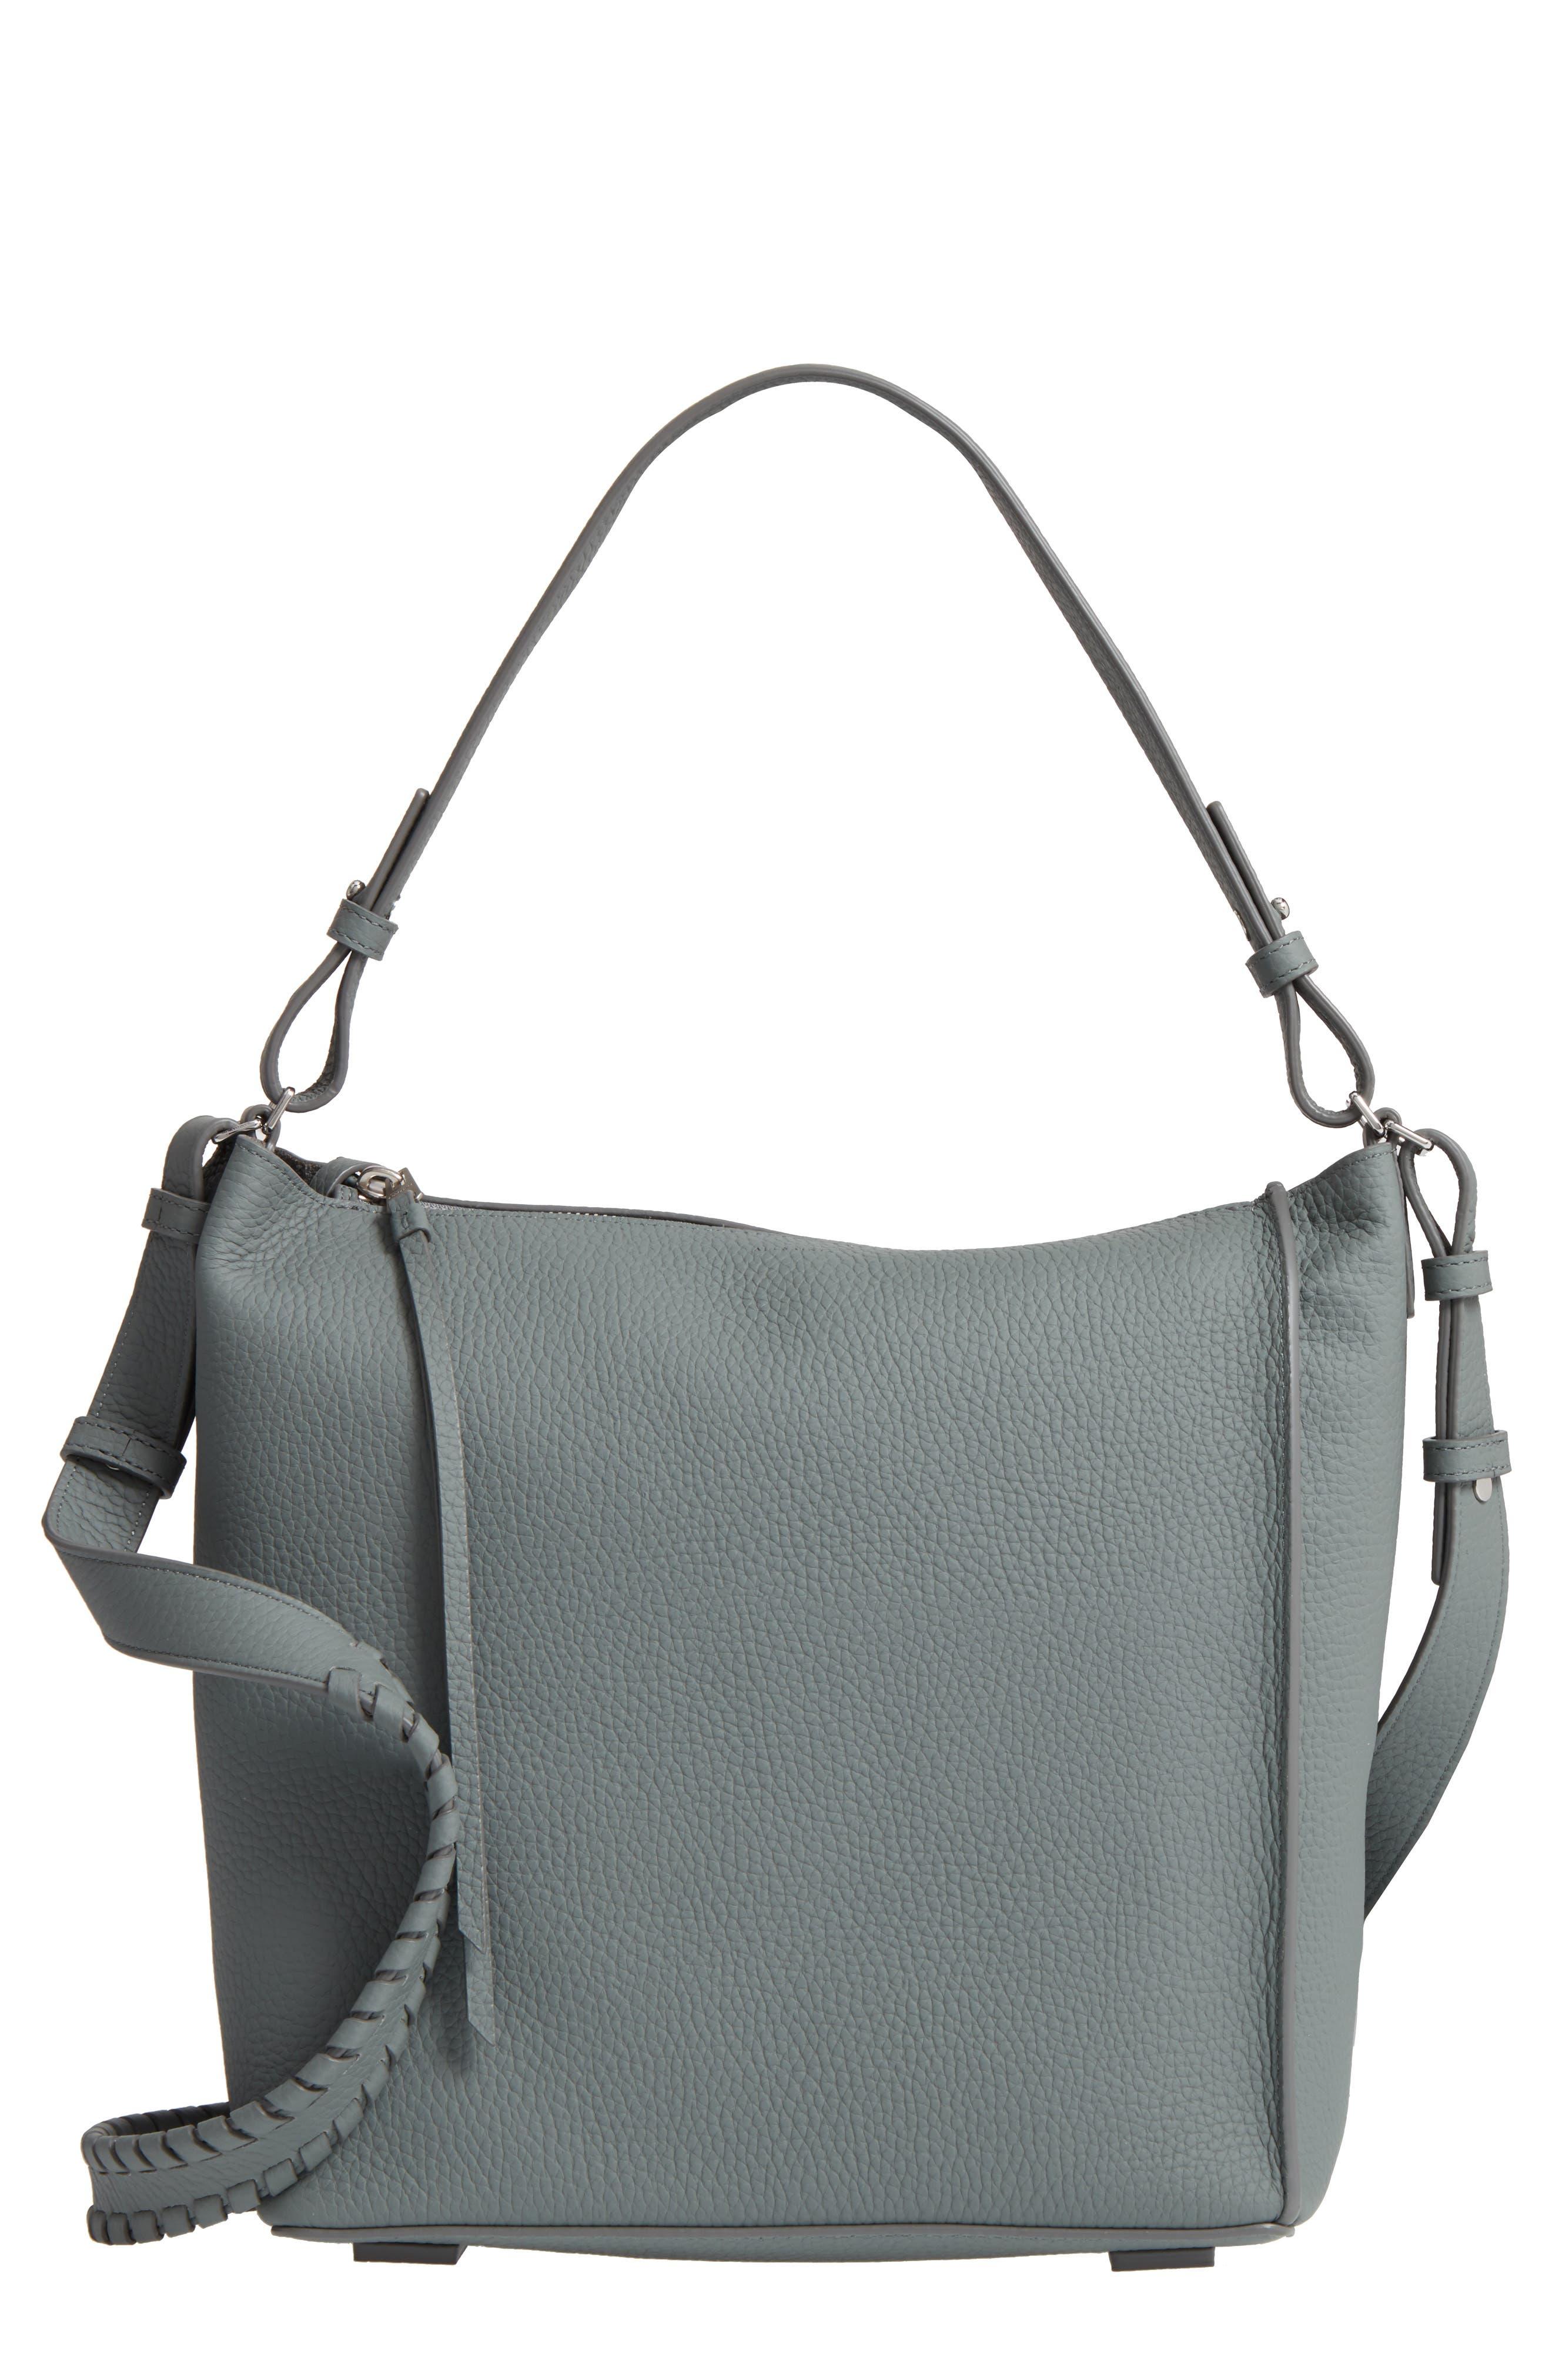 ALLSAINTS 'Kita' Leather Shoulder/Crossbody Bag